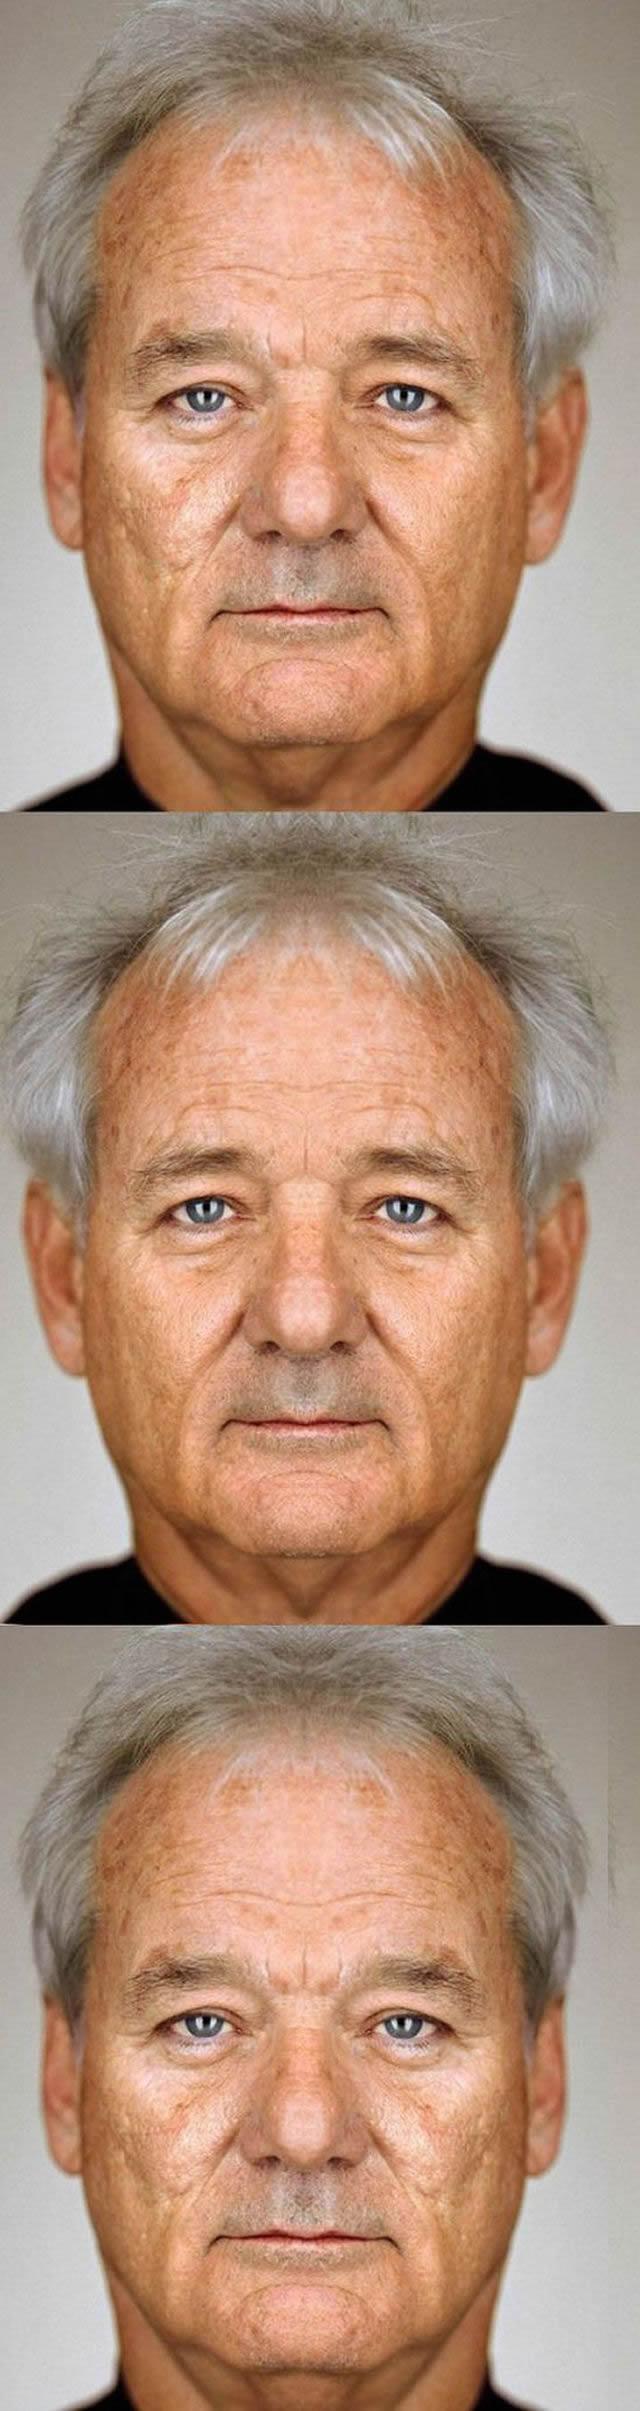 rostros simetricos famosos (2)